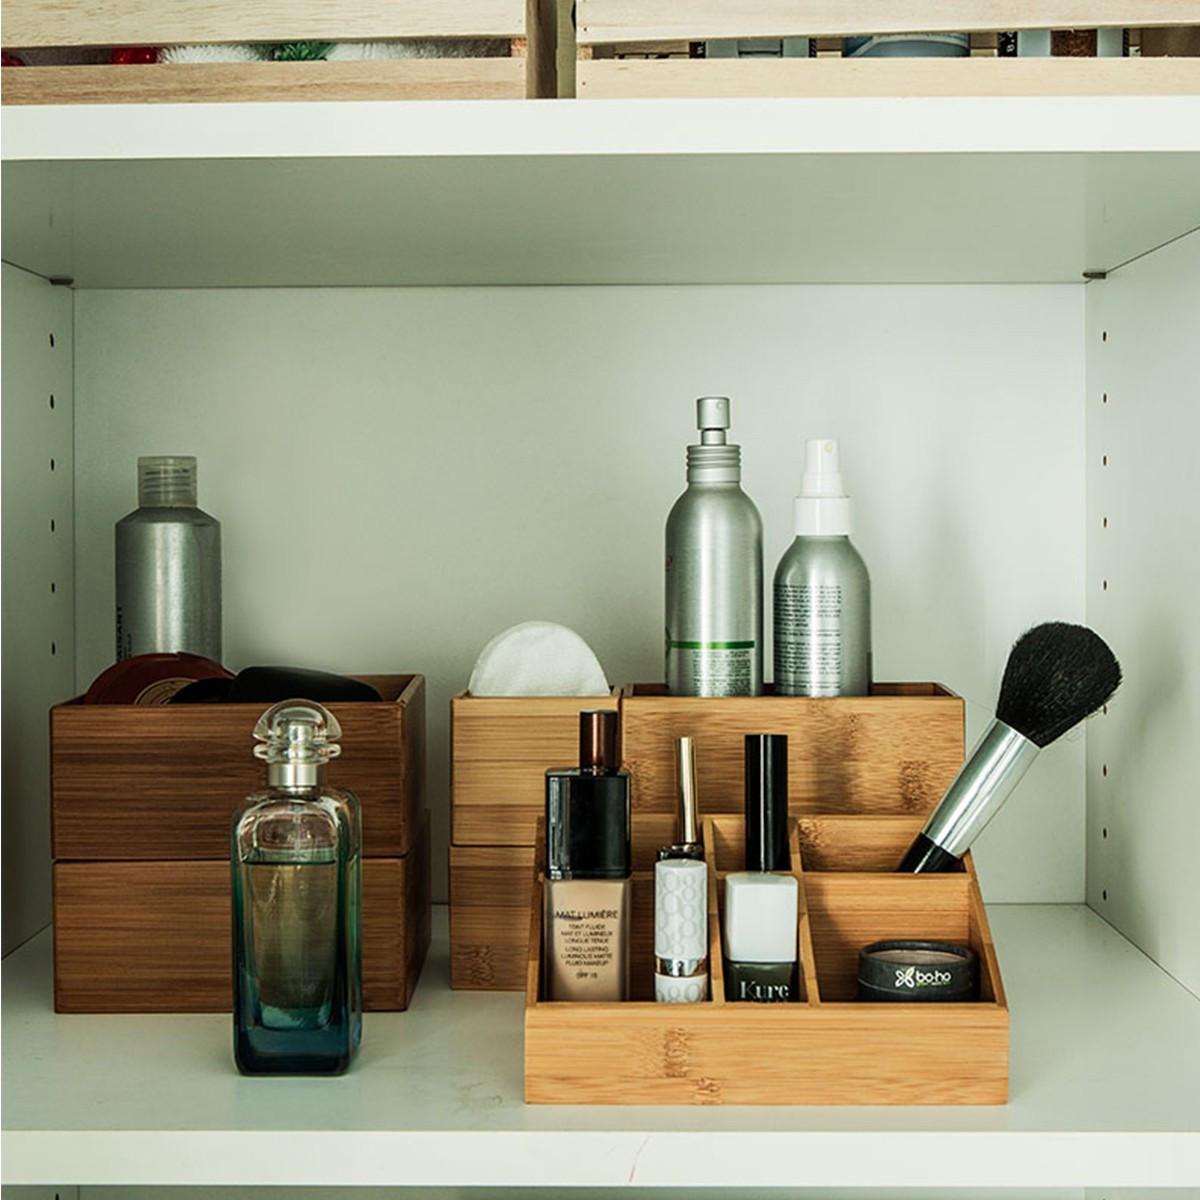 Petit bac carr bambou rangement tiroirs - Organisateur tiroir cuisine ...